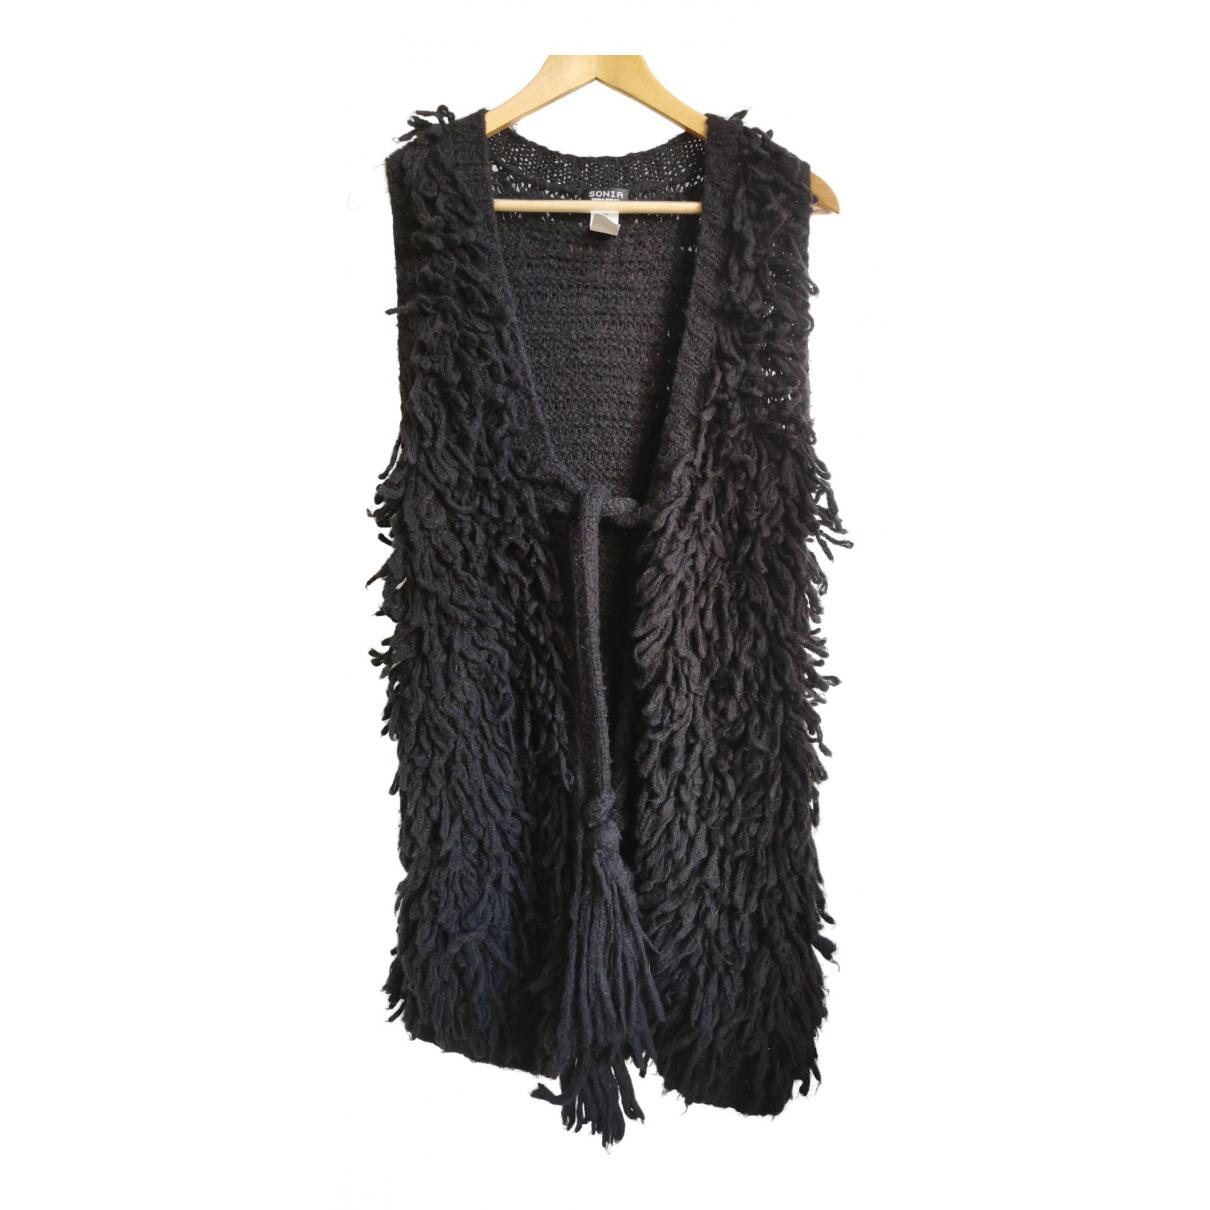 Sonia By Sonia Rykiel - Pull   pour femme en laine - noir